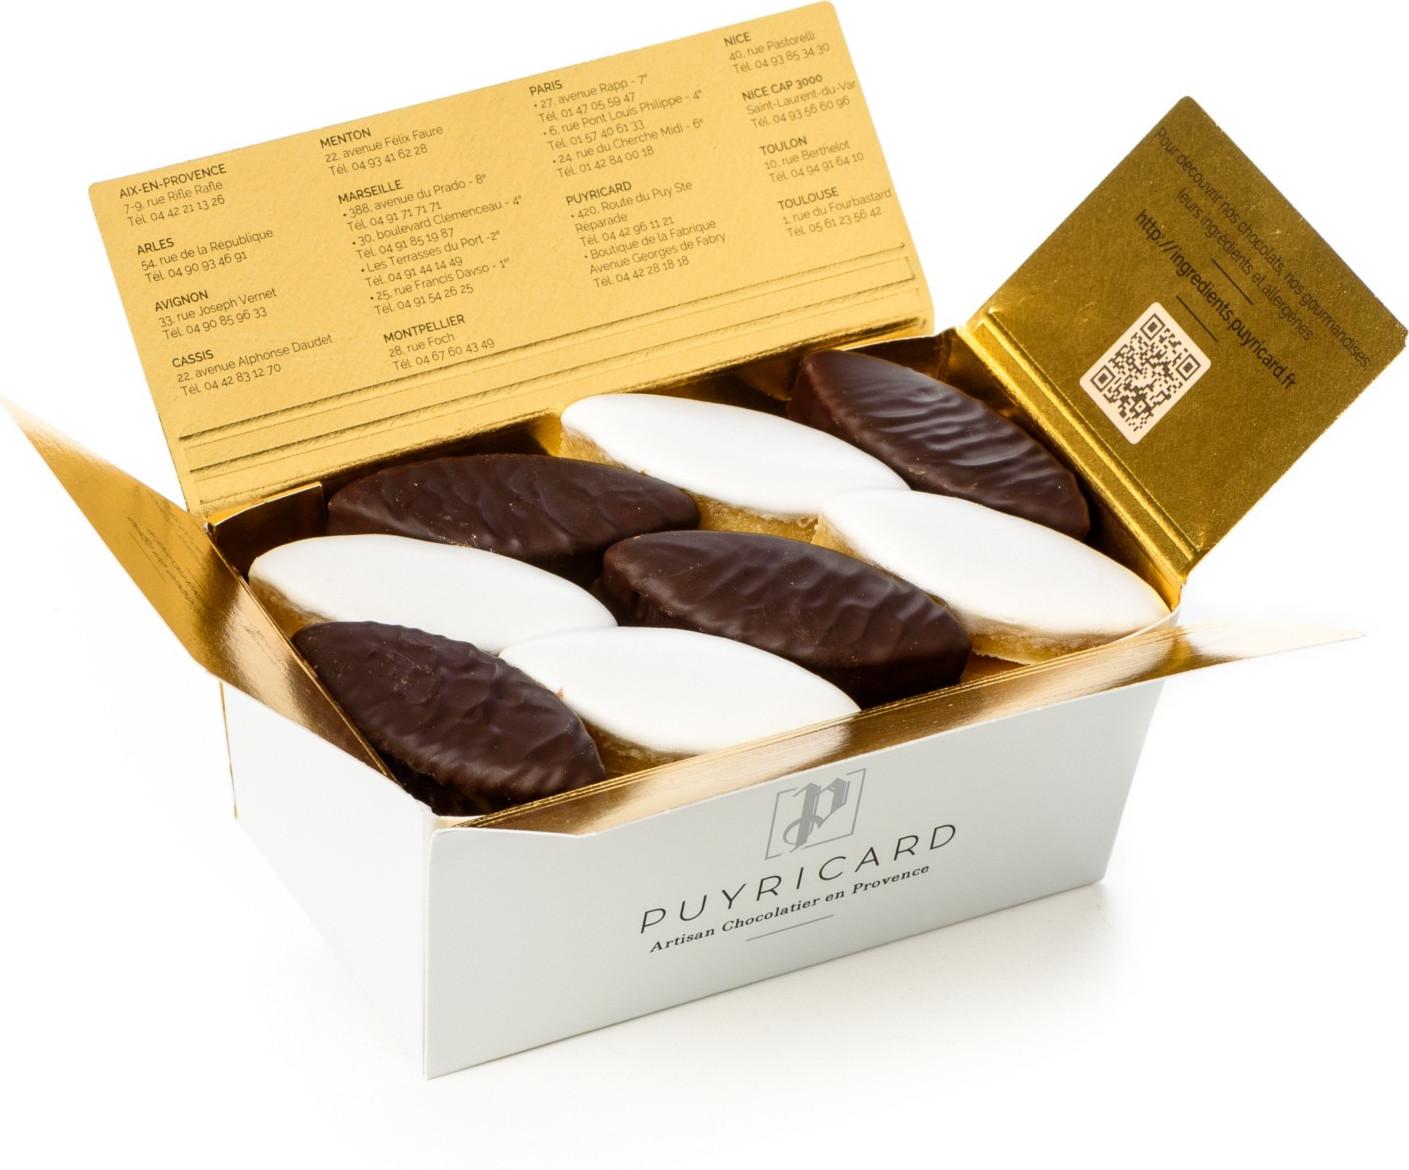 Ballotin chocolats Palets d'Or 230g